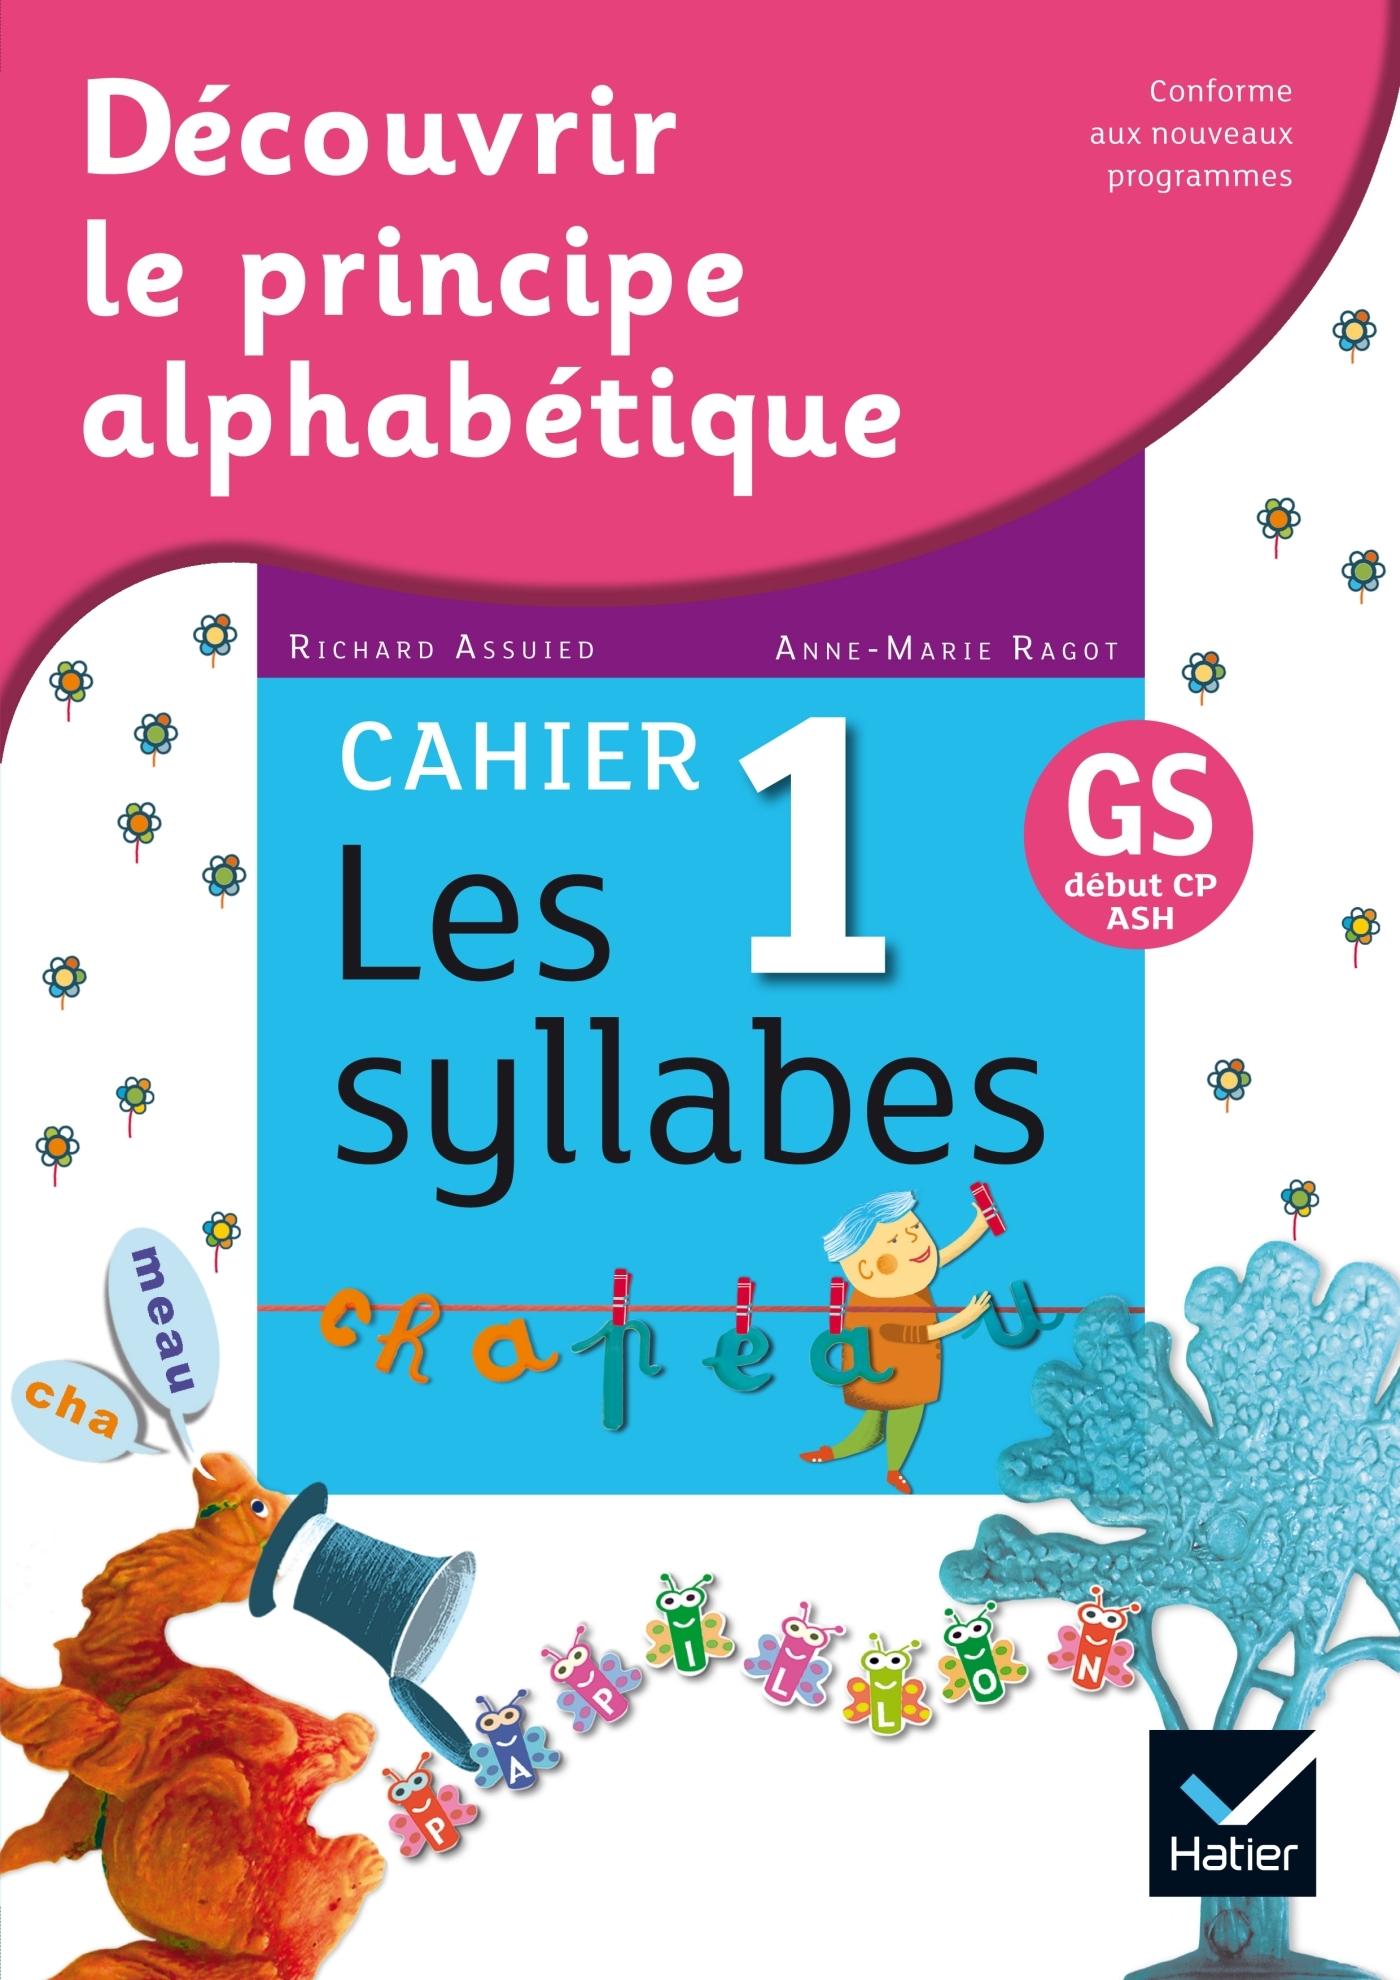 DECOUVRIR LE PRINCIPE ALPHABETIQUE - CAHIER 1 - LES SYLLABES